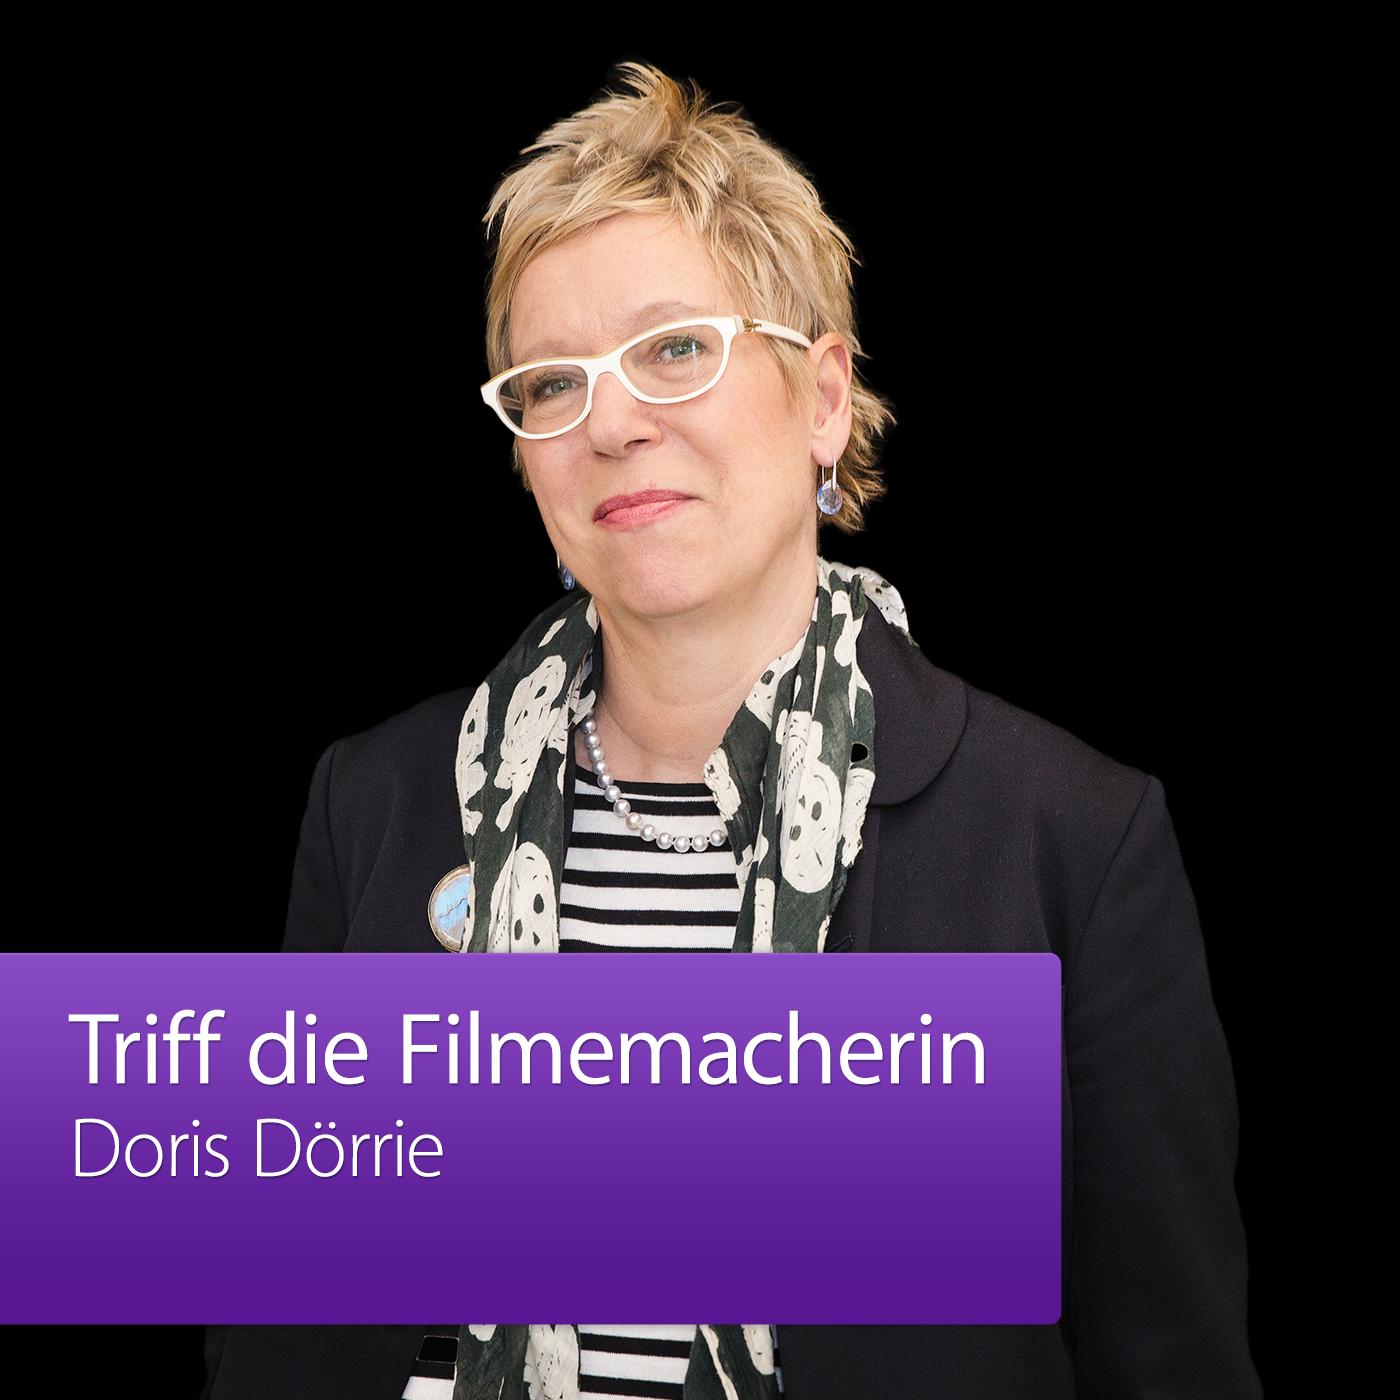 Doris Dörrie: Triff die Filmemacherin